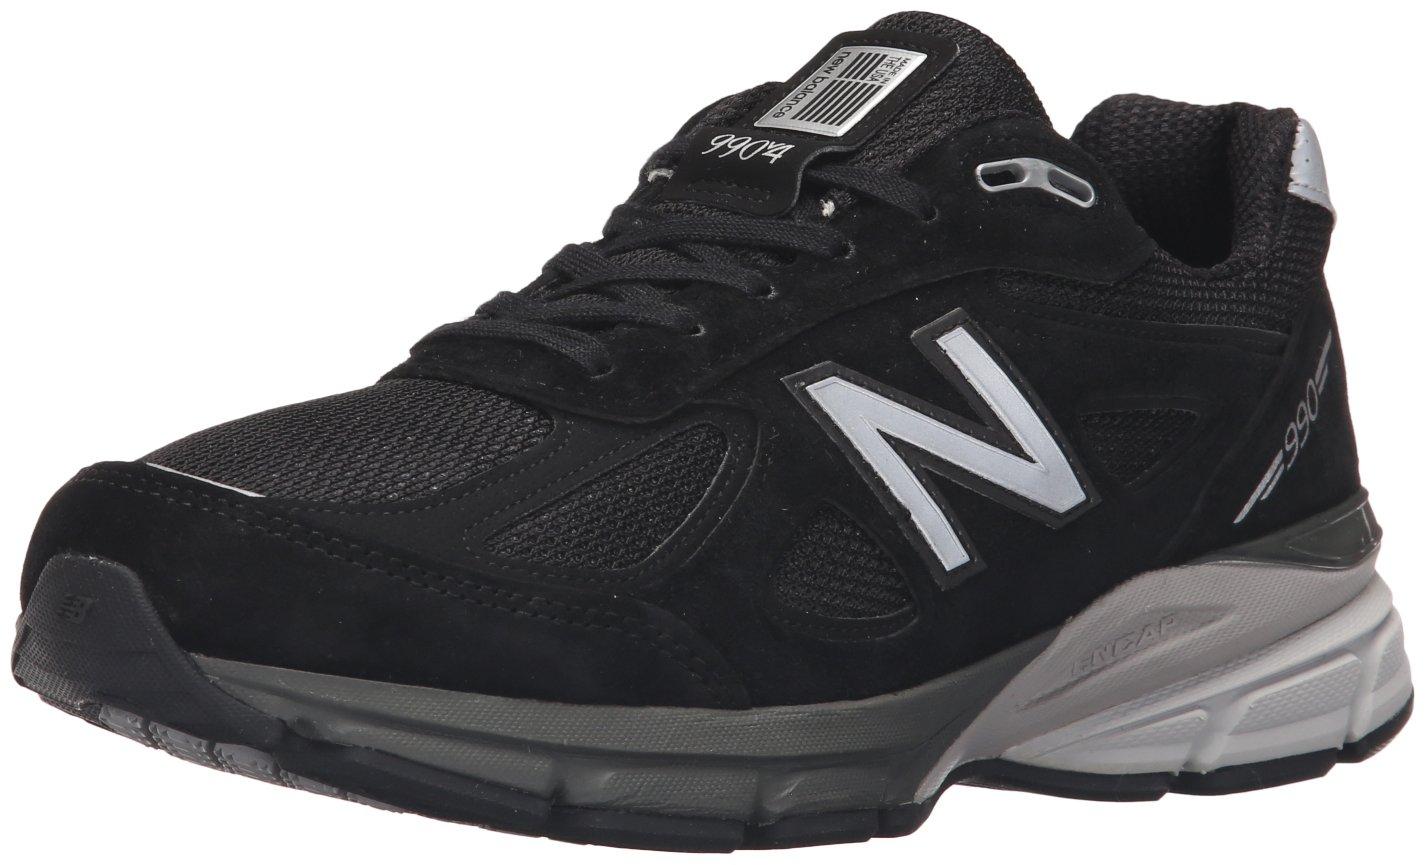 New Balance Men's M990BK4 Running Shoe, Black/Silver, 10.5 D US